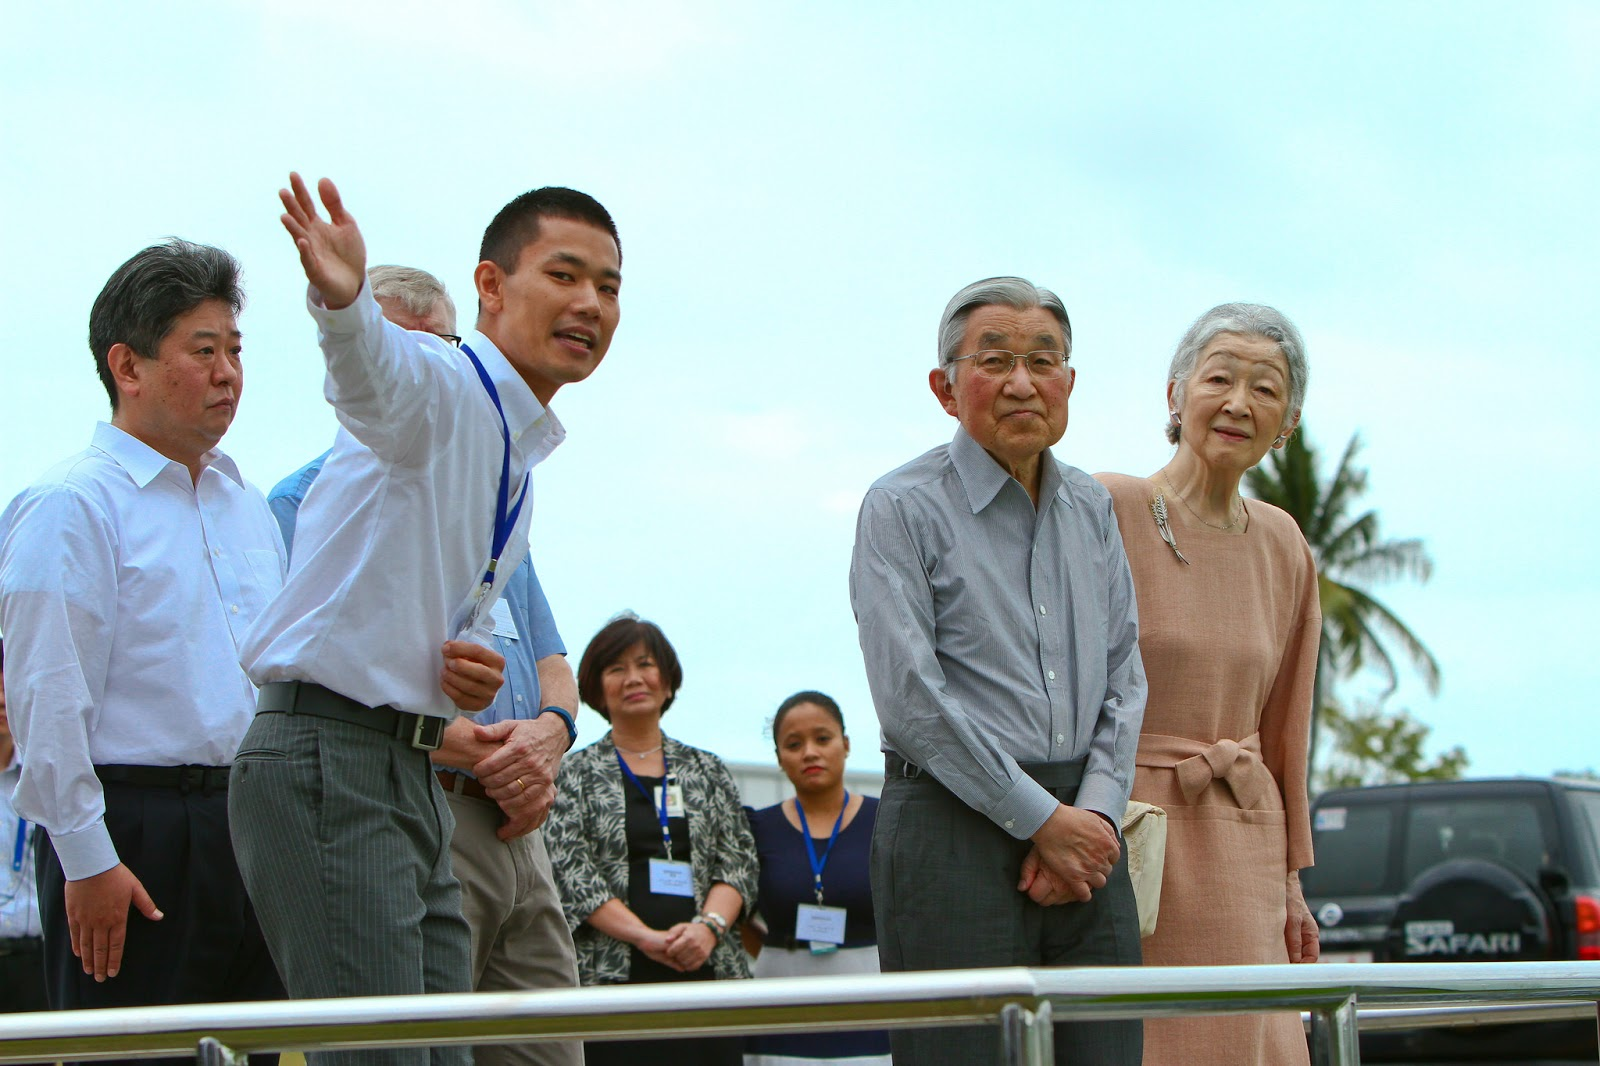 Their Majesties Emperor Akihito and Empress Michiko  at the LTCCE view deck with IRRI scientist Yoichiro  Kato,  (Photo: IRRI/Isagani Serrano)